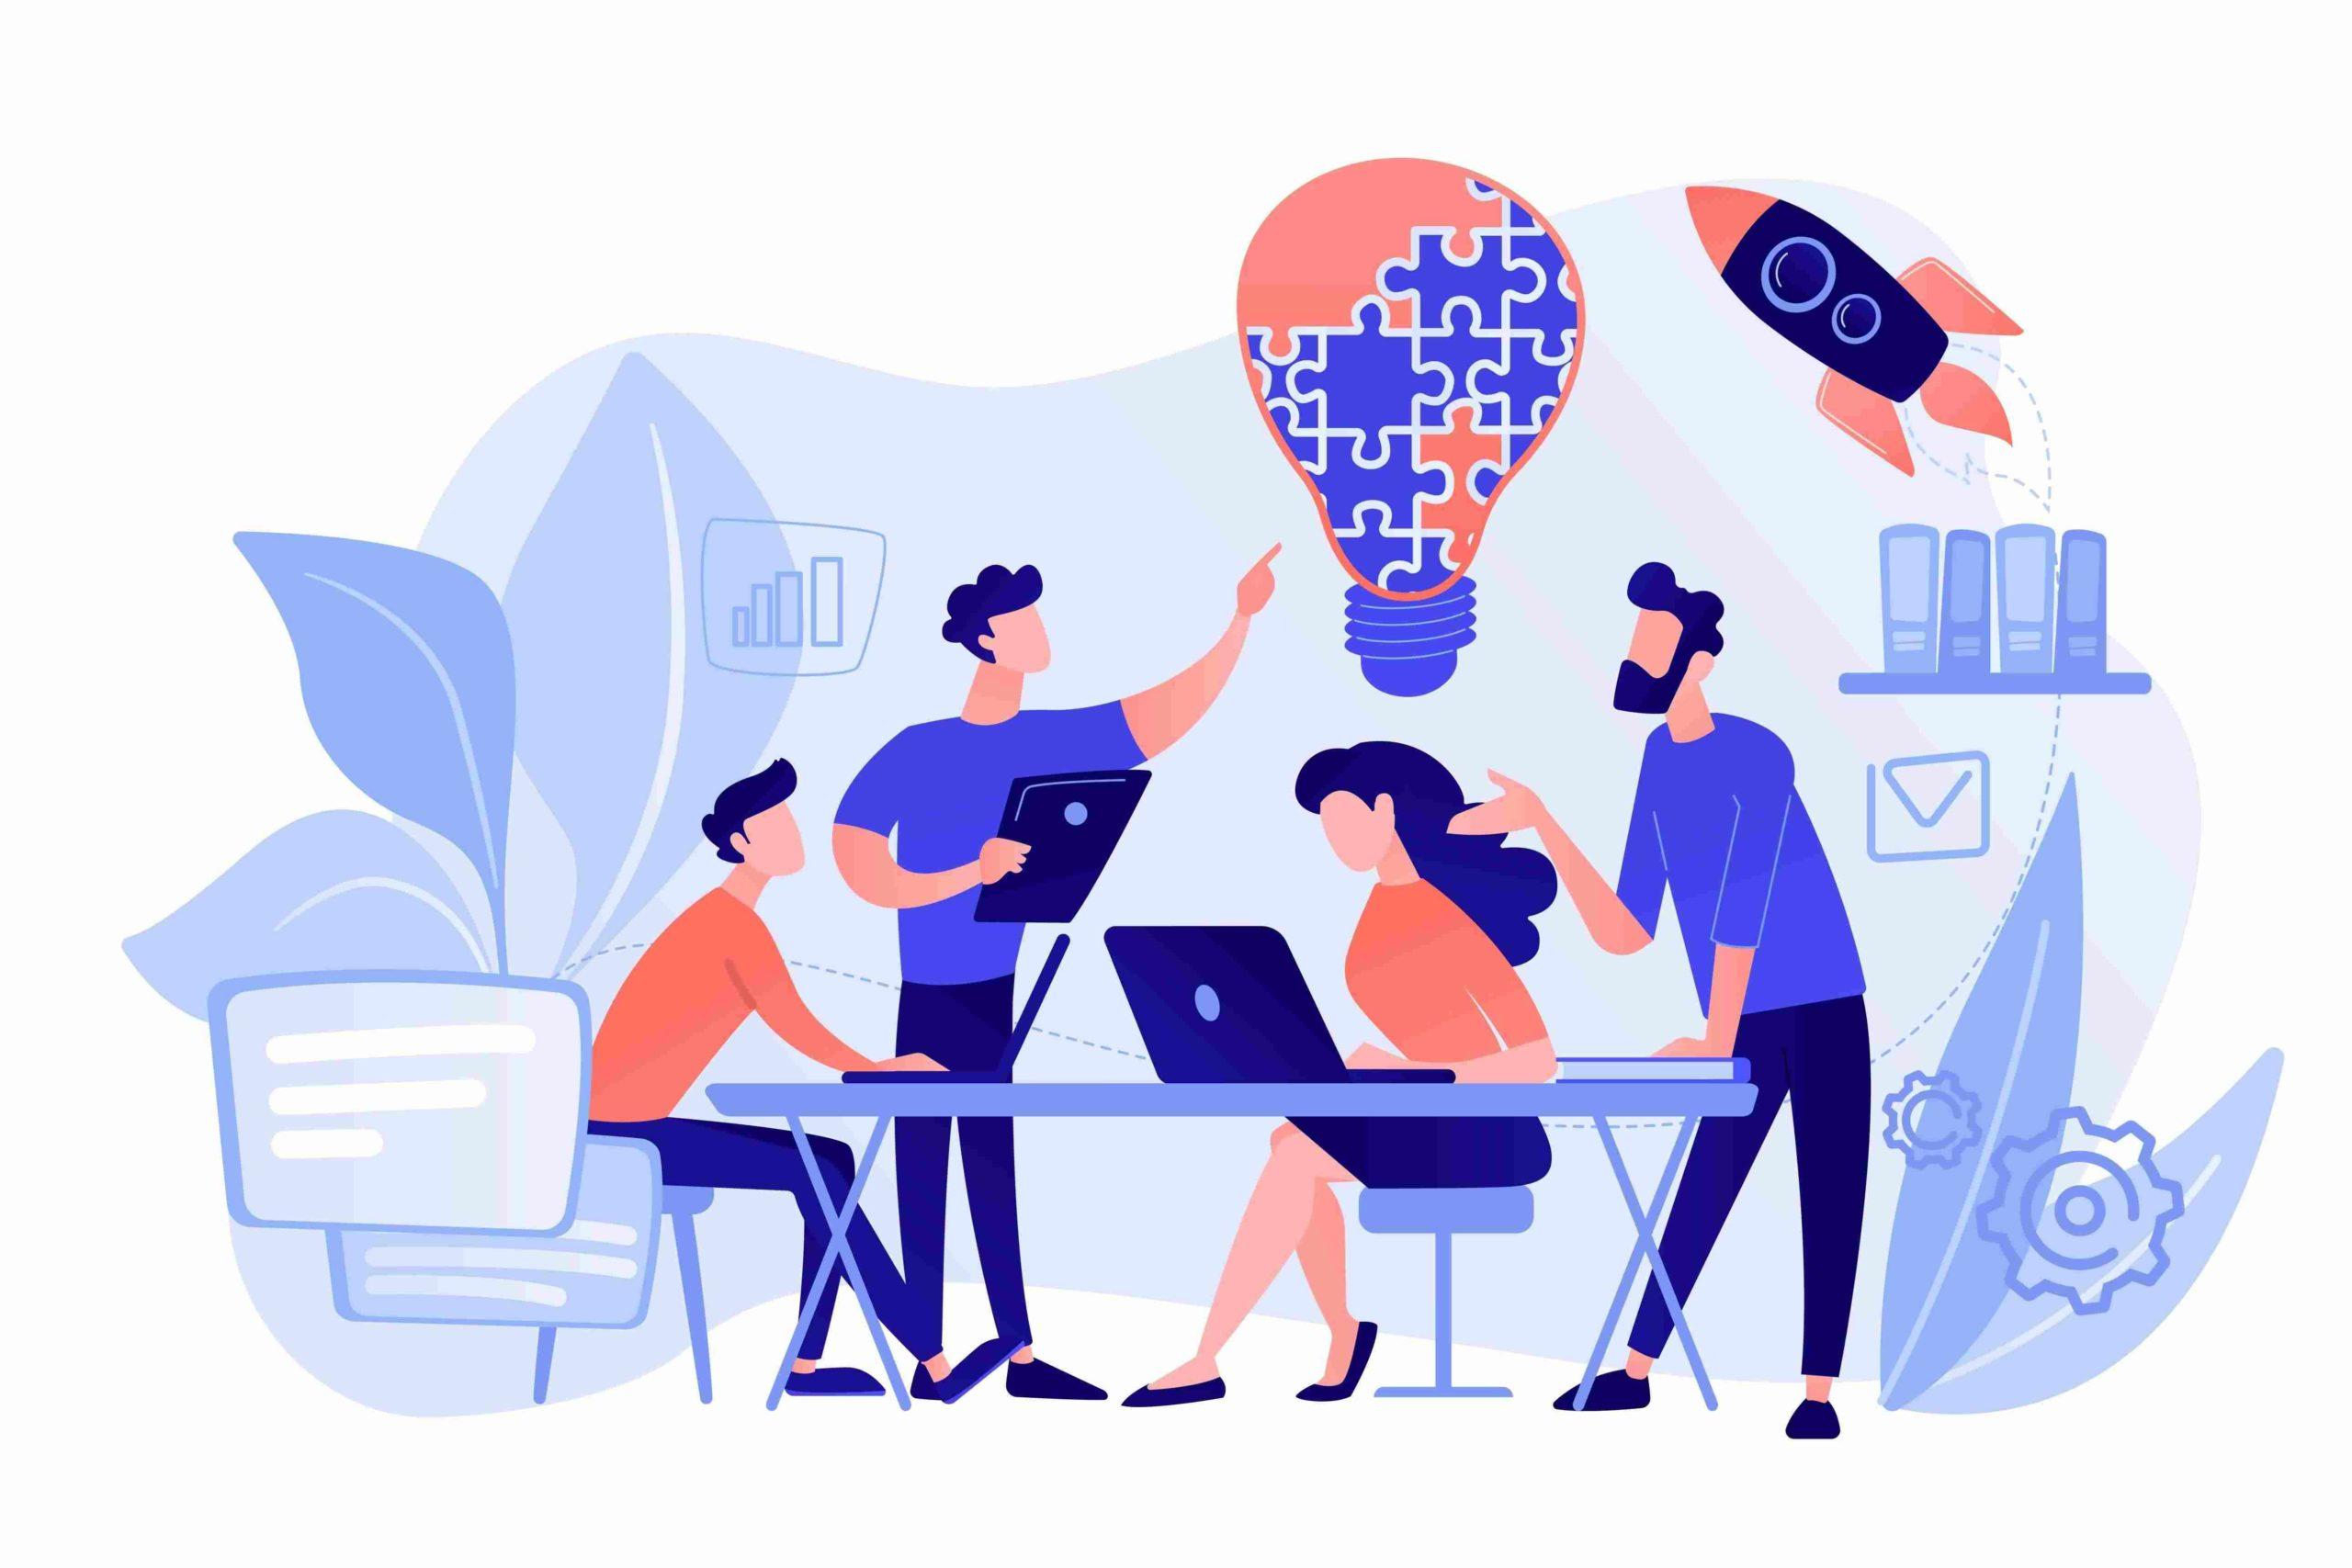 Software engineering companies work culture